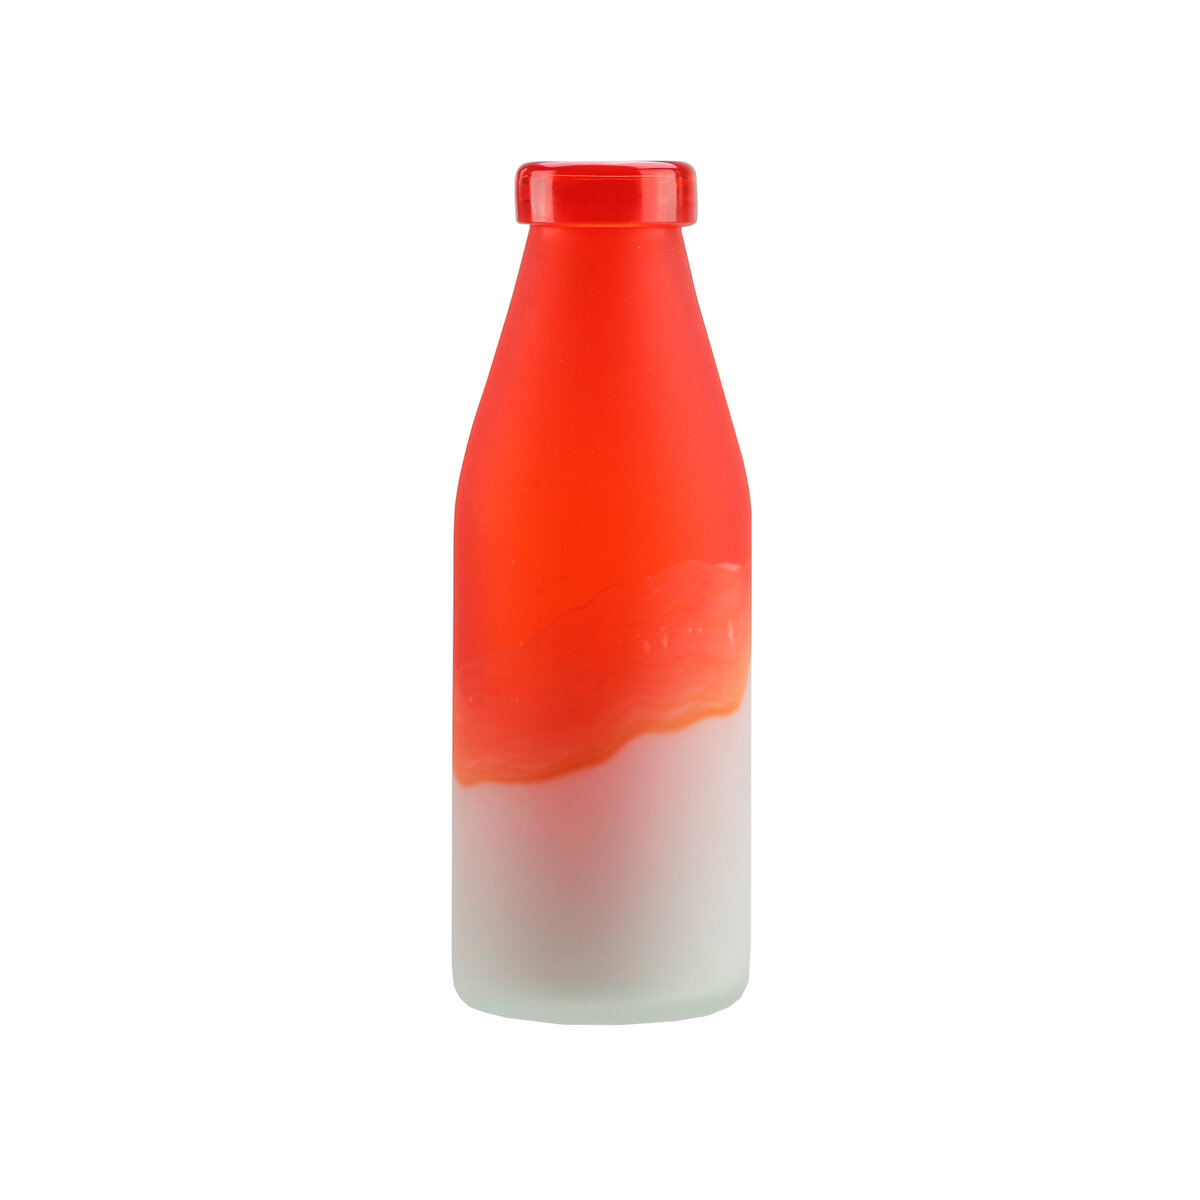 Northlight Milk Bottle Style Hand Blown Glass Vase Wayfair